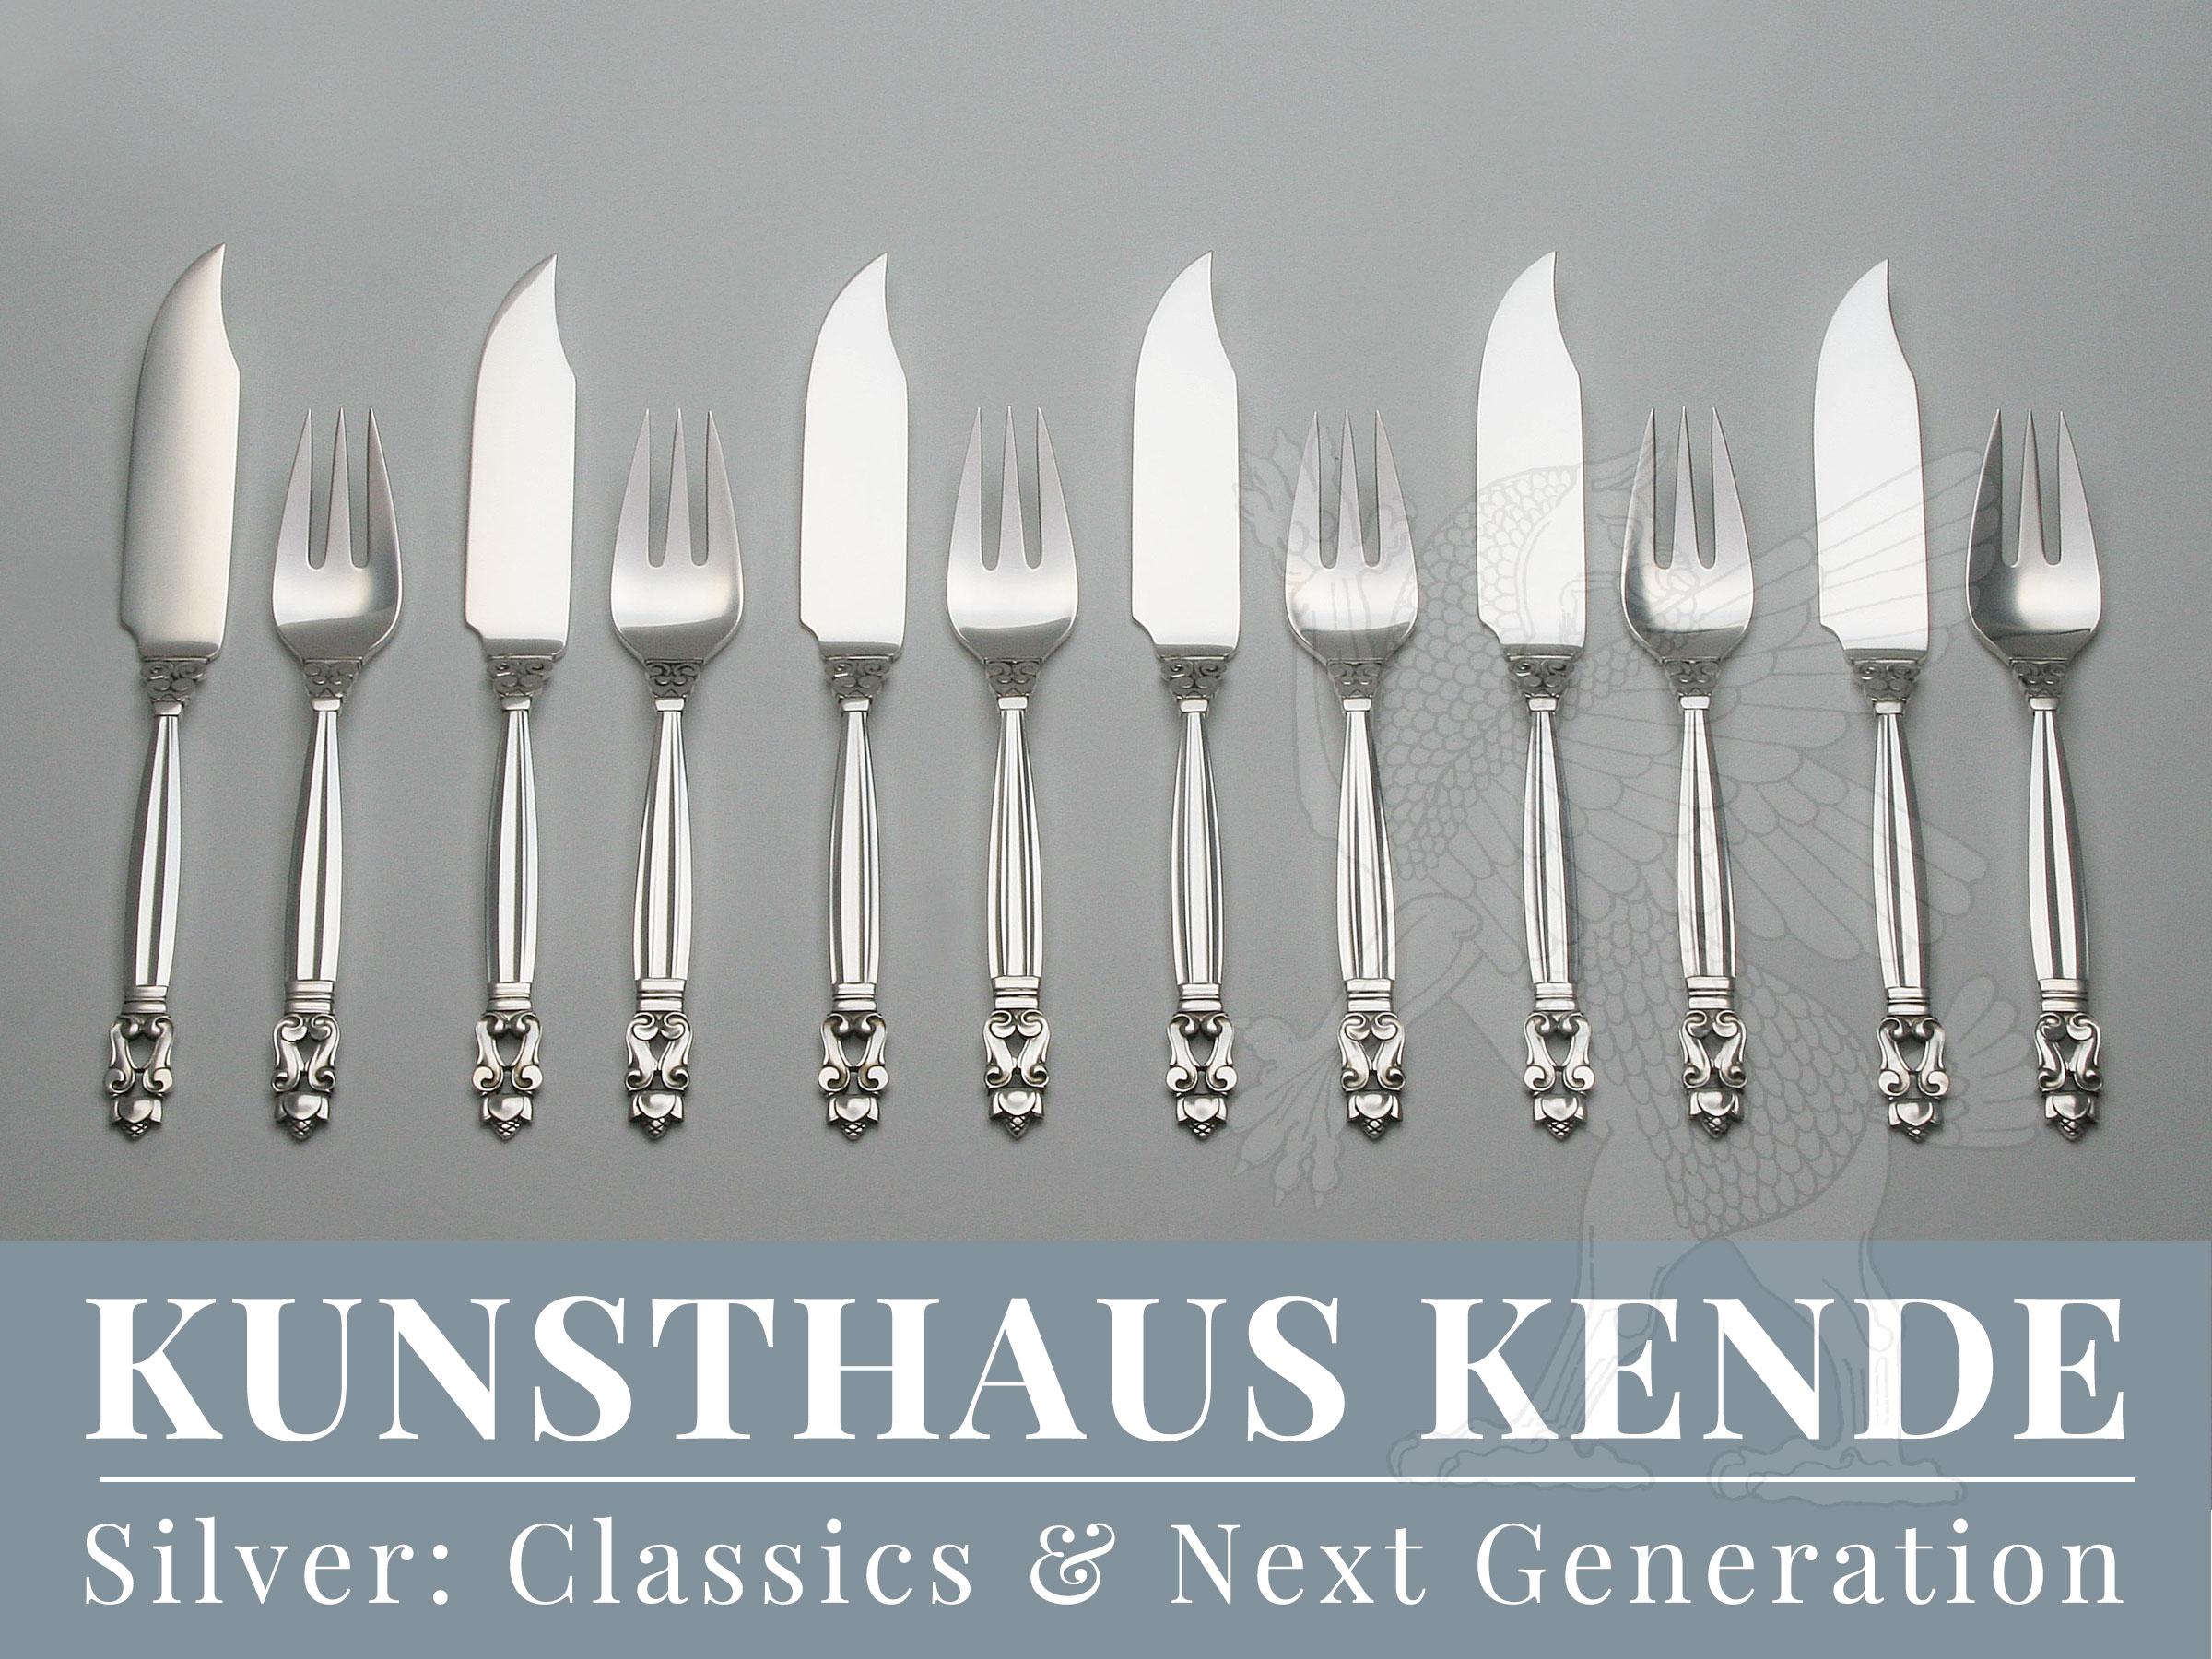 Georg Jensen Acorn Fischbesteck Silber cutlery Johan Rohde set knife arcon